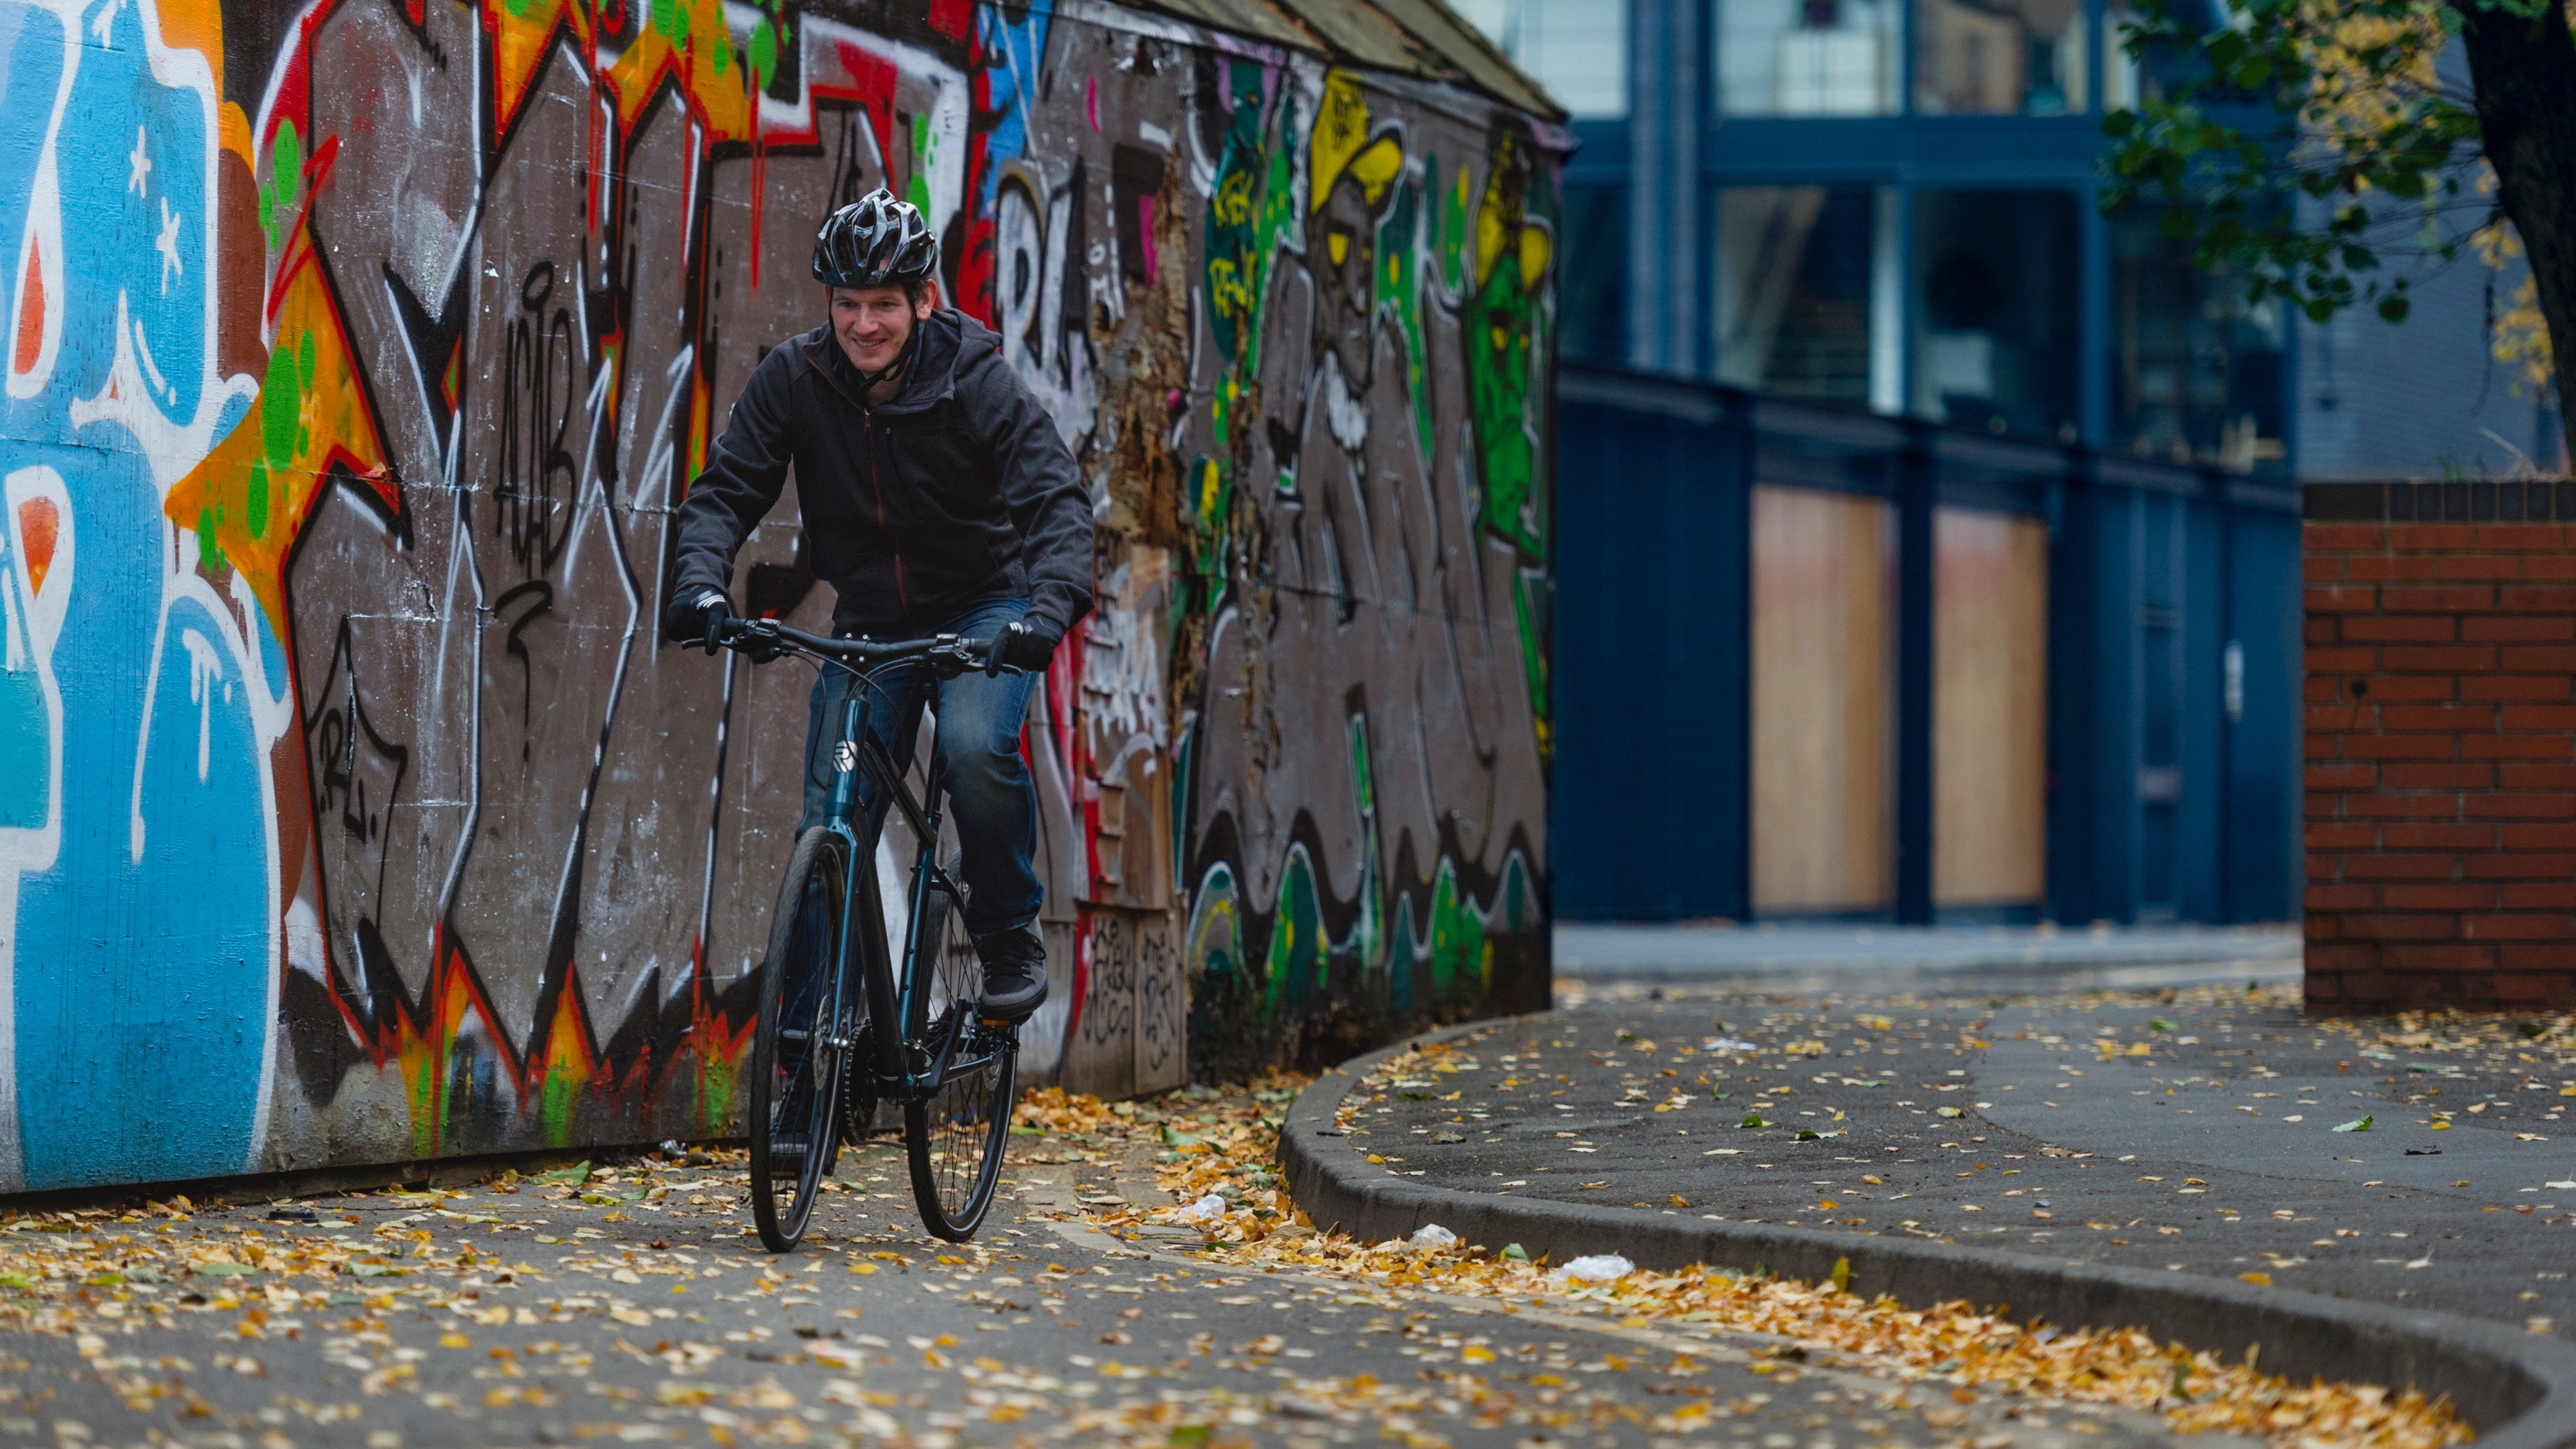 How to choose a commuting bike